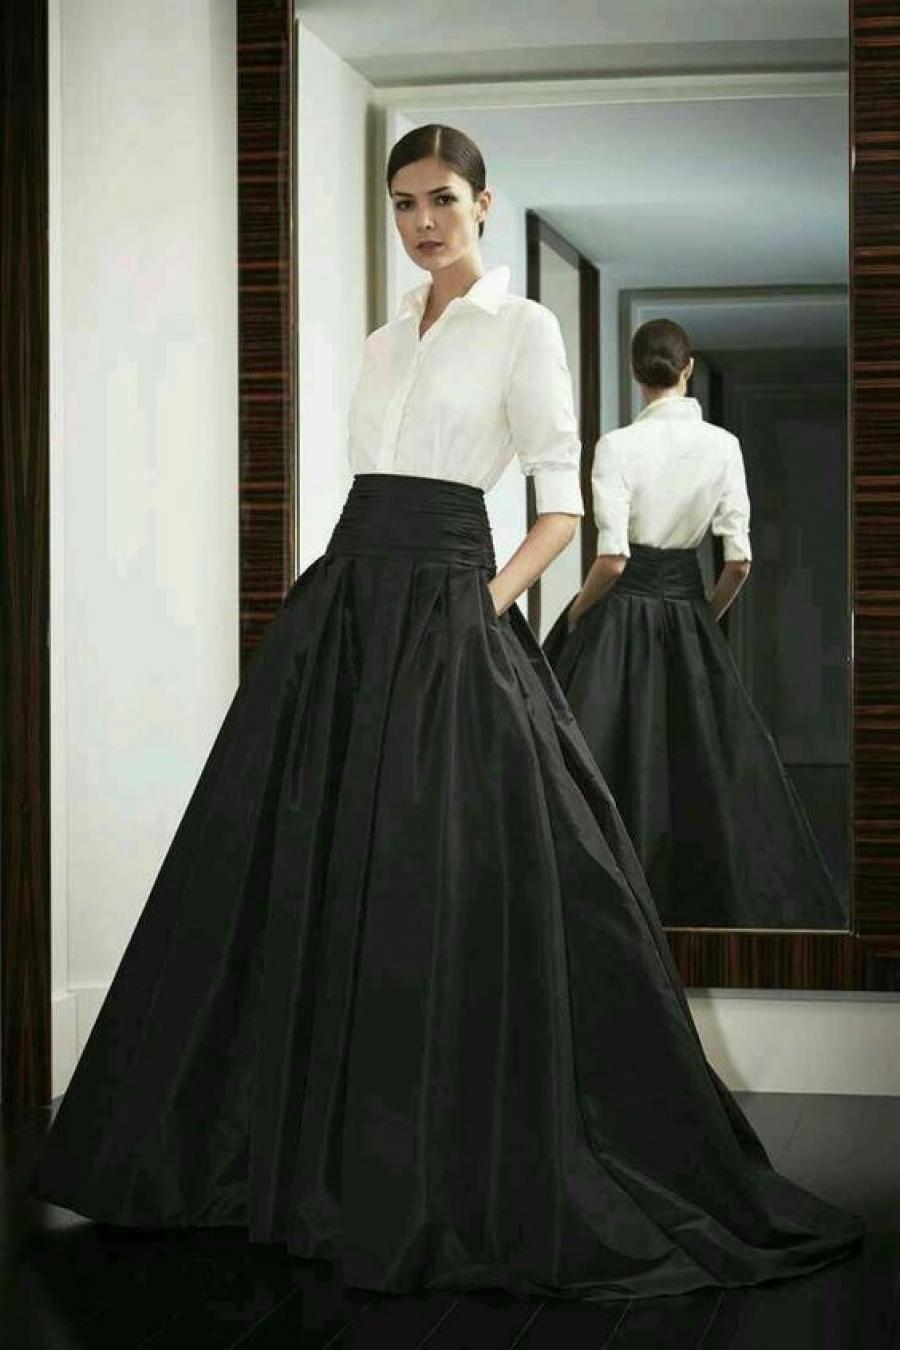 a07f5602f TodoBoda.com - 10 vestidos de fiesta con escote clásico